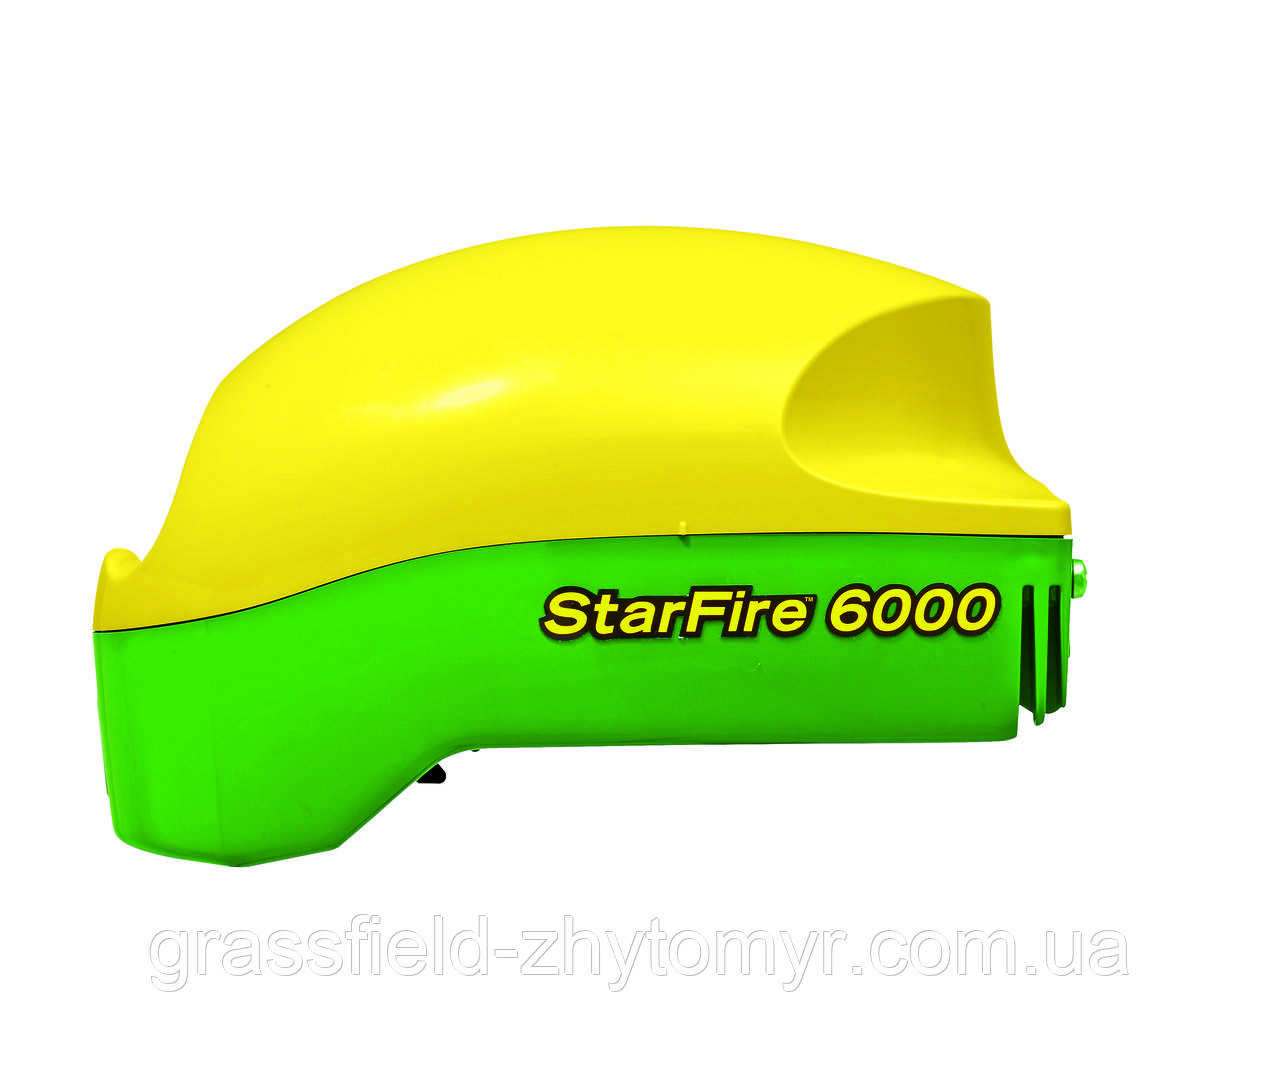 Приймач StarFire 6000 / Приемник StarFire 6000